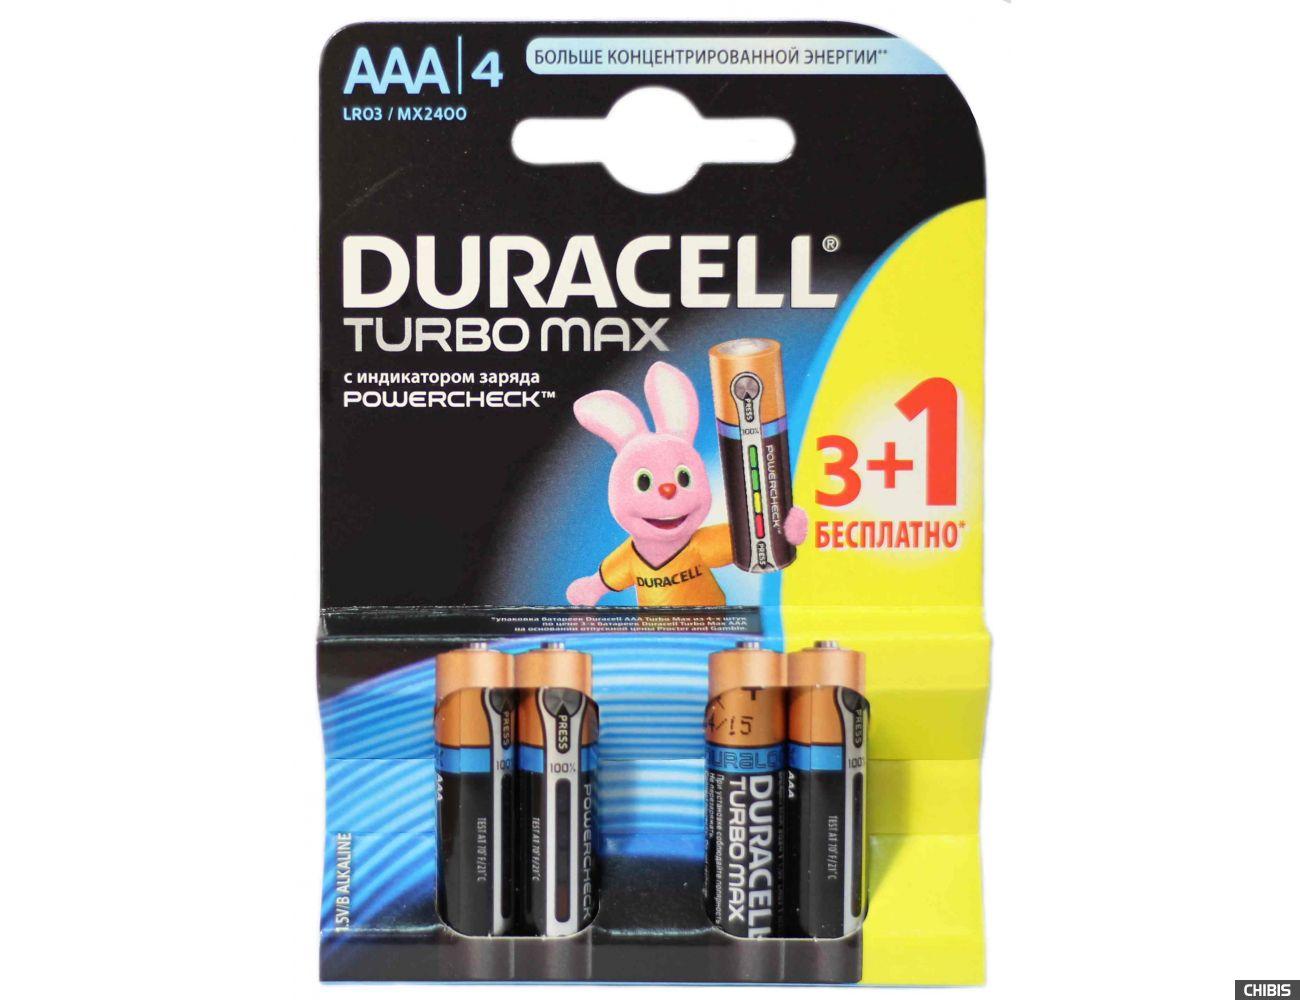 атарейка ААА Duracell Turbo LR03, 1.5V, Alkaline Щелочная 3 шт+1 бесплатно 1/4шт